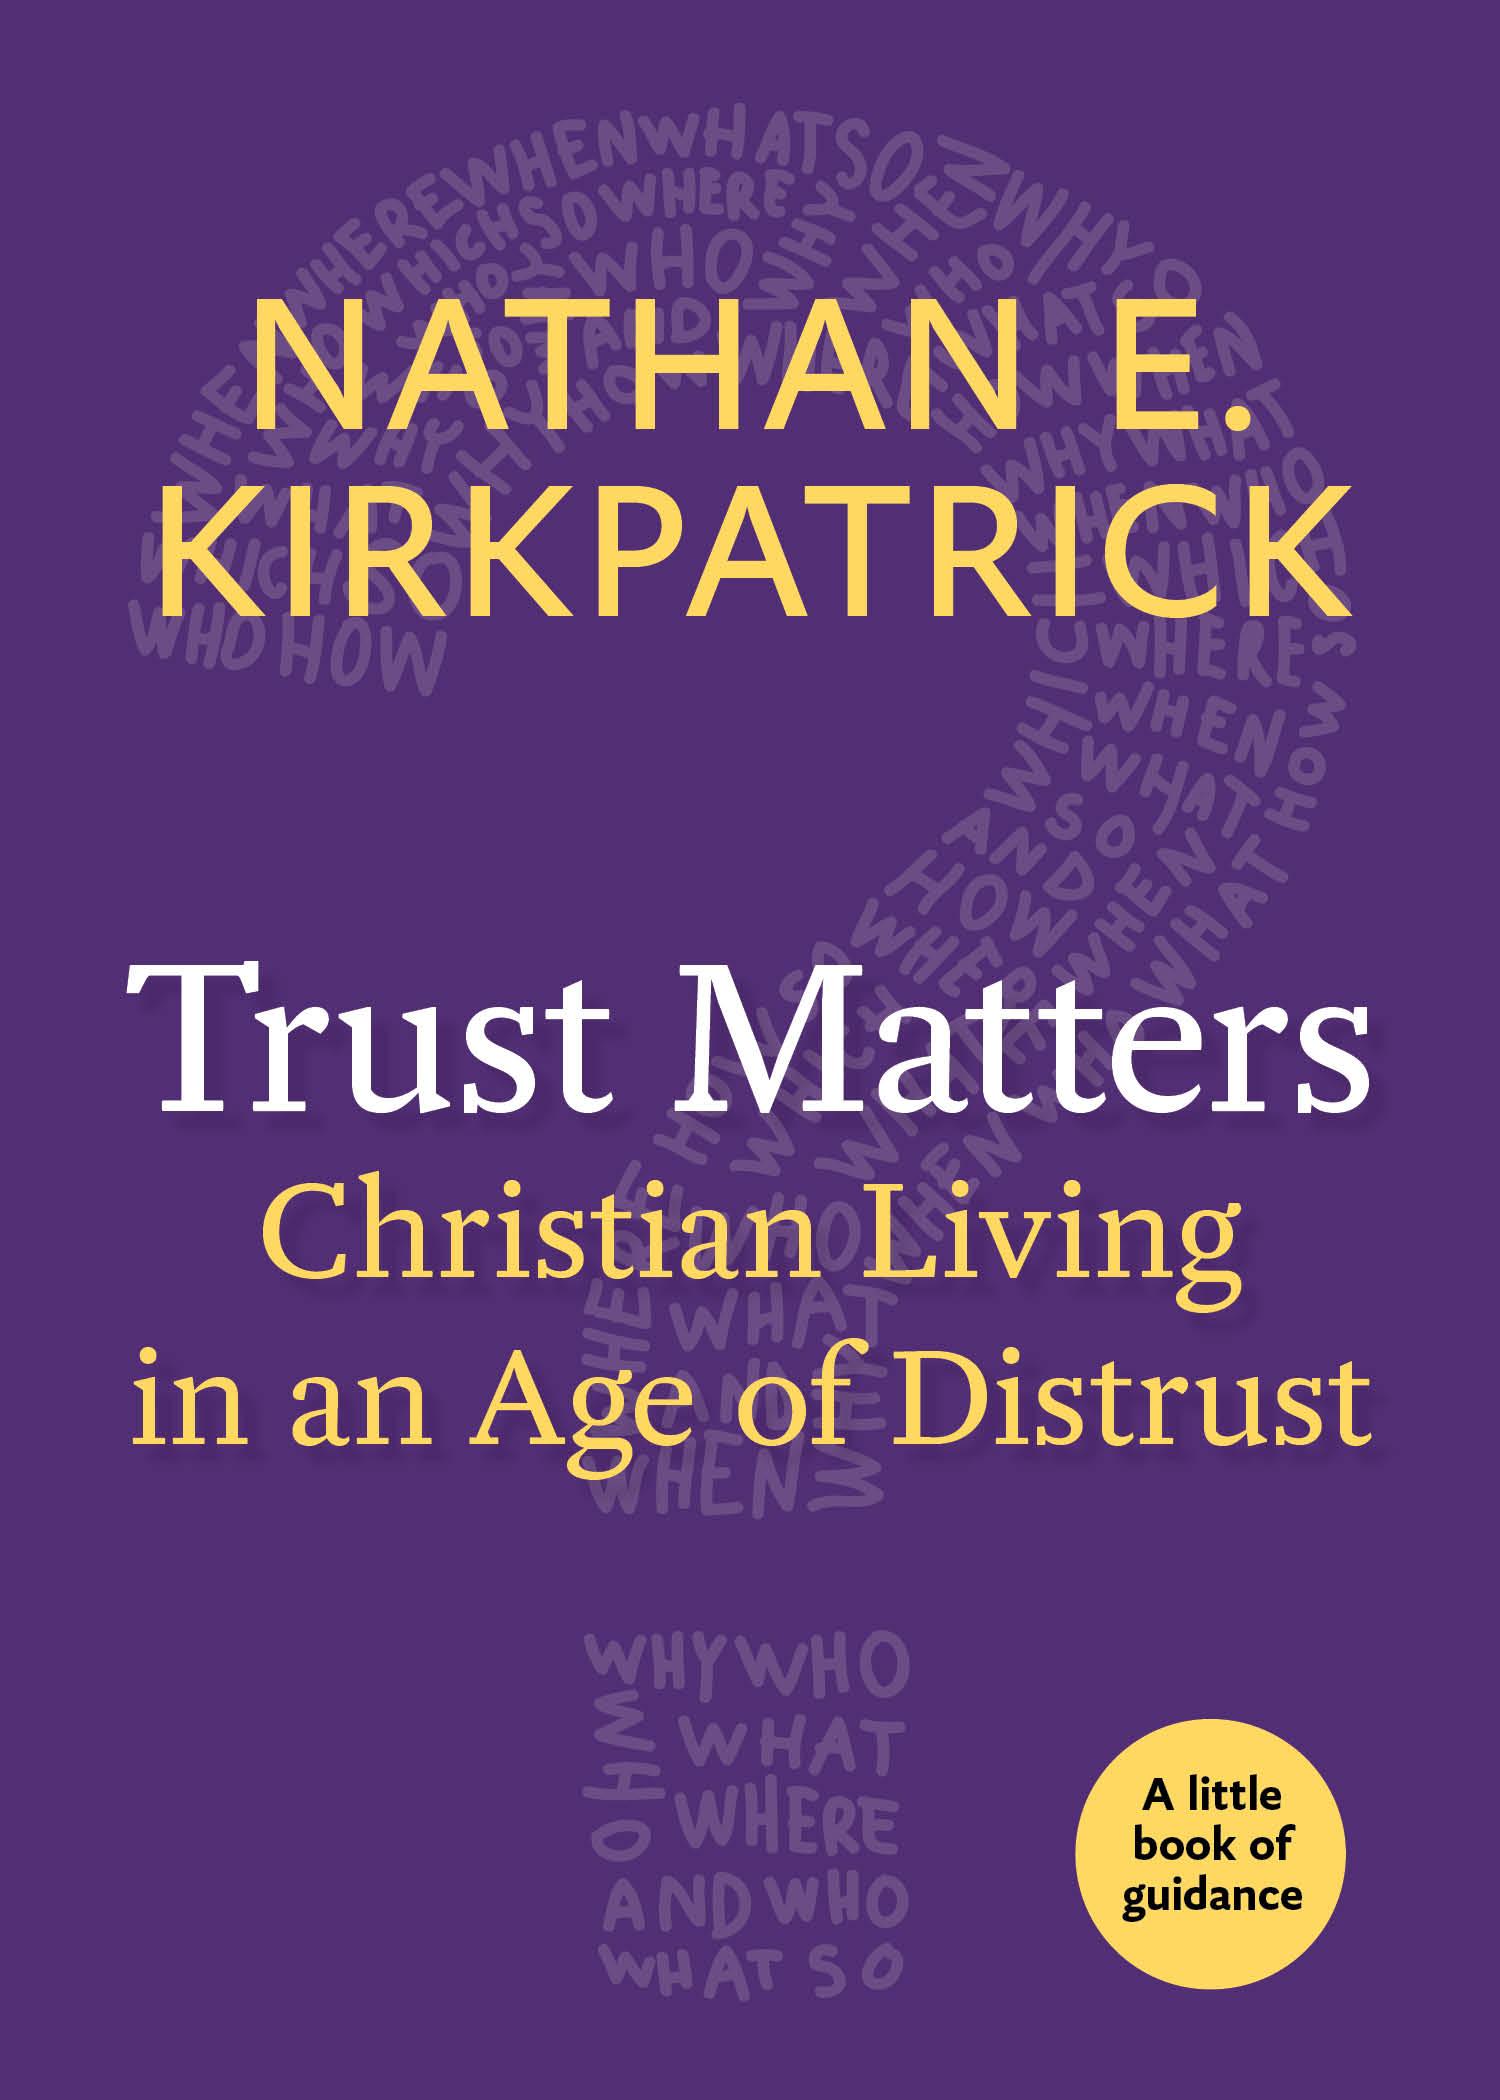 1f727dcbce8 ChurchPublishing.org: Little Books of Guidance